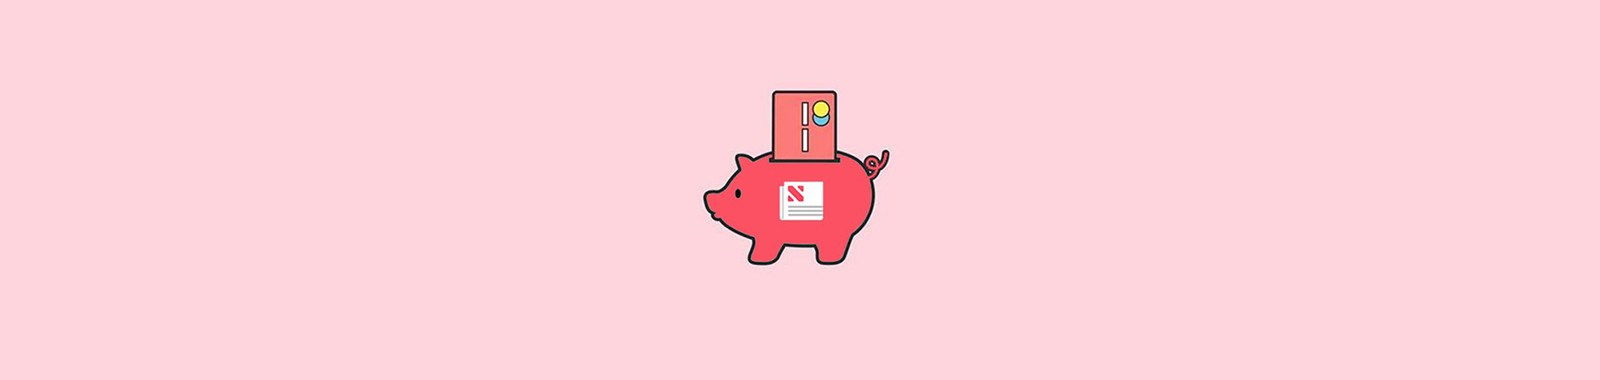 apple-news-piggy-bank-eye